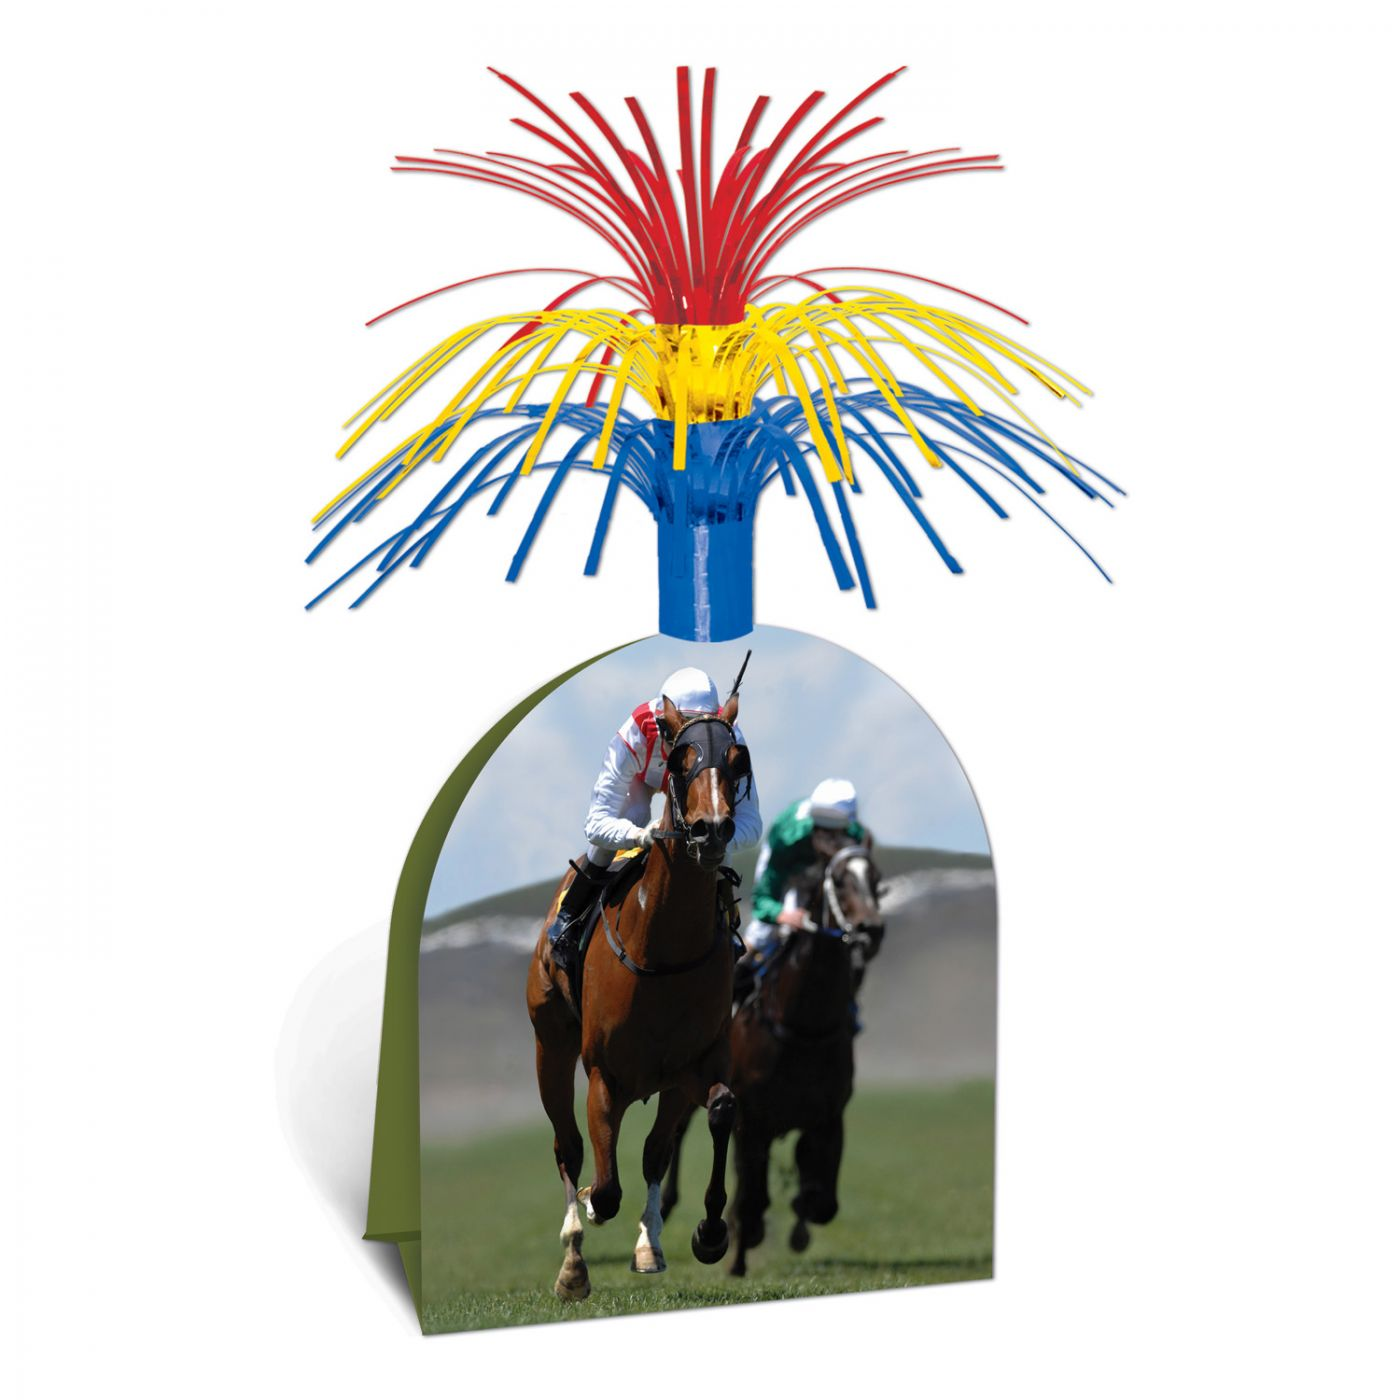 Horse Racing Centerpiece image